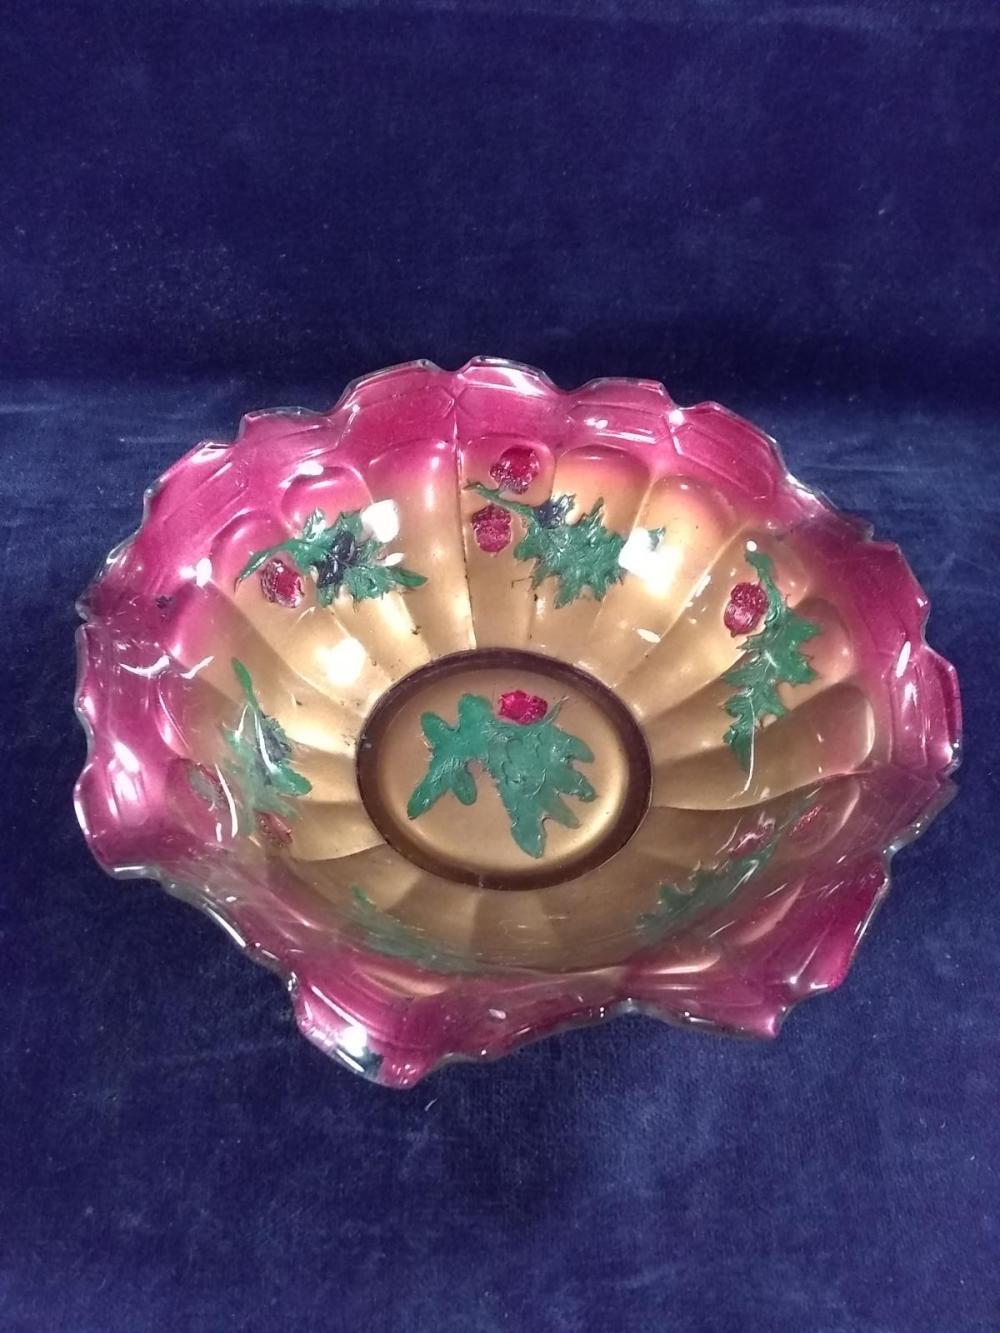 Vintage Ruffled Edge Goofus Glass Bowl